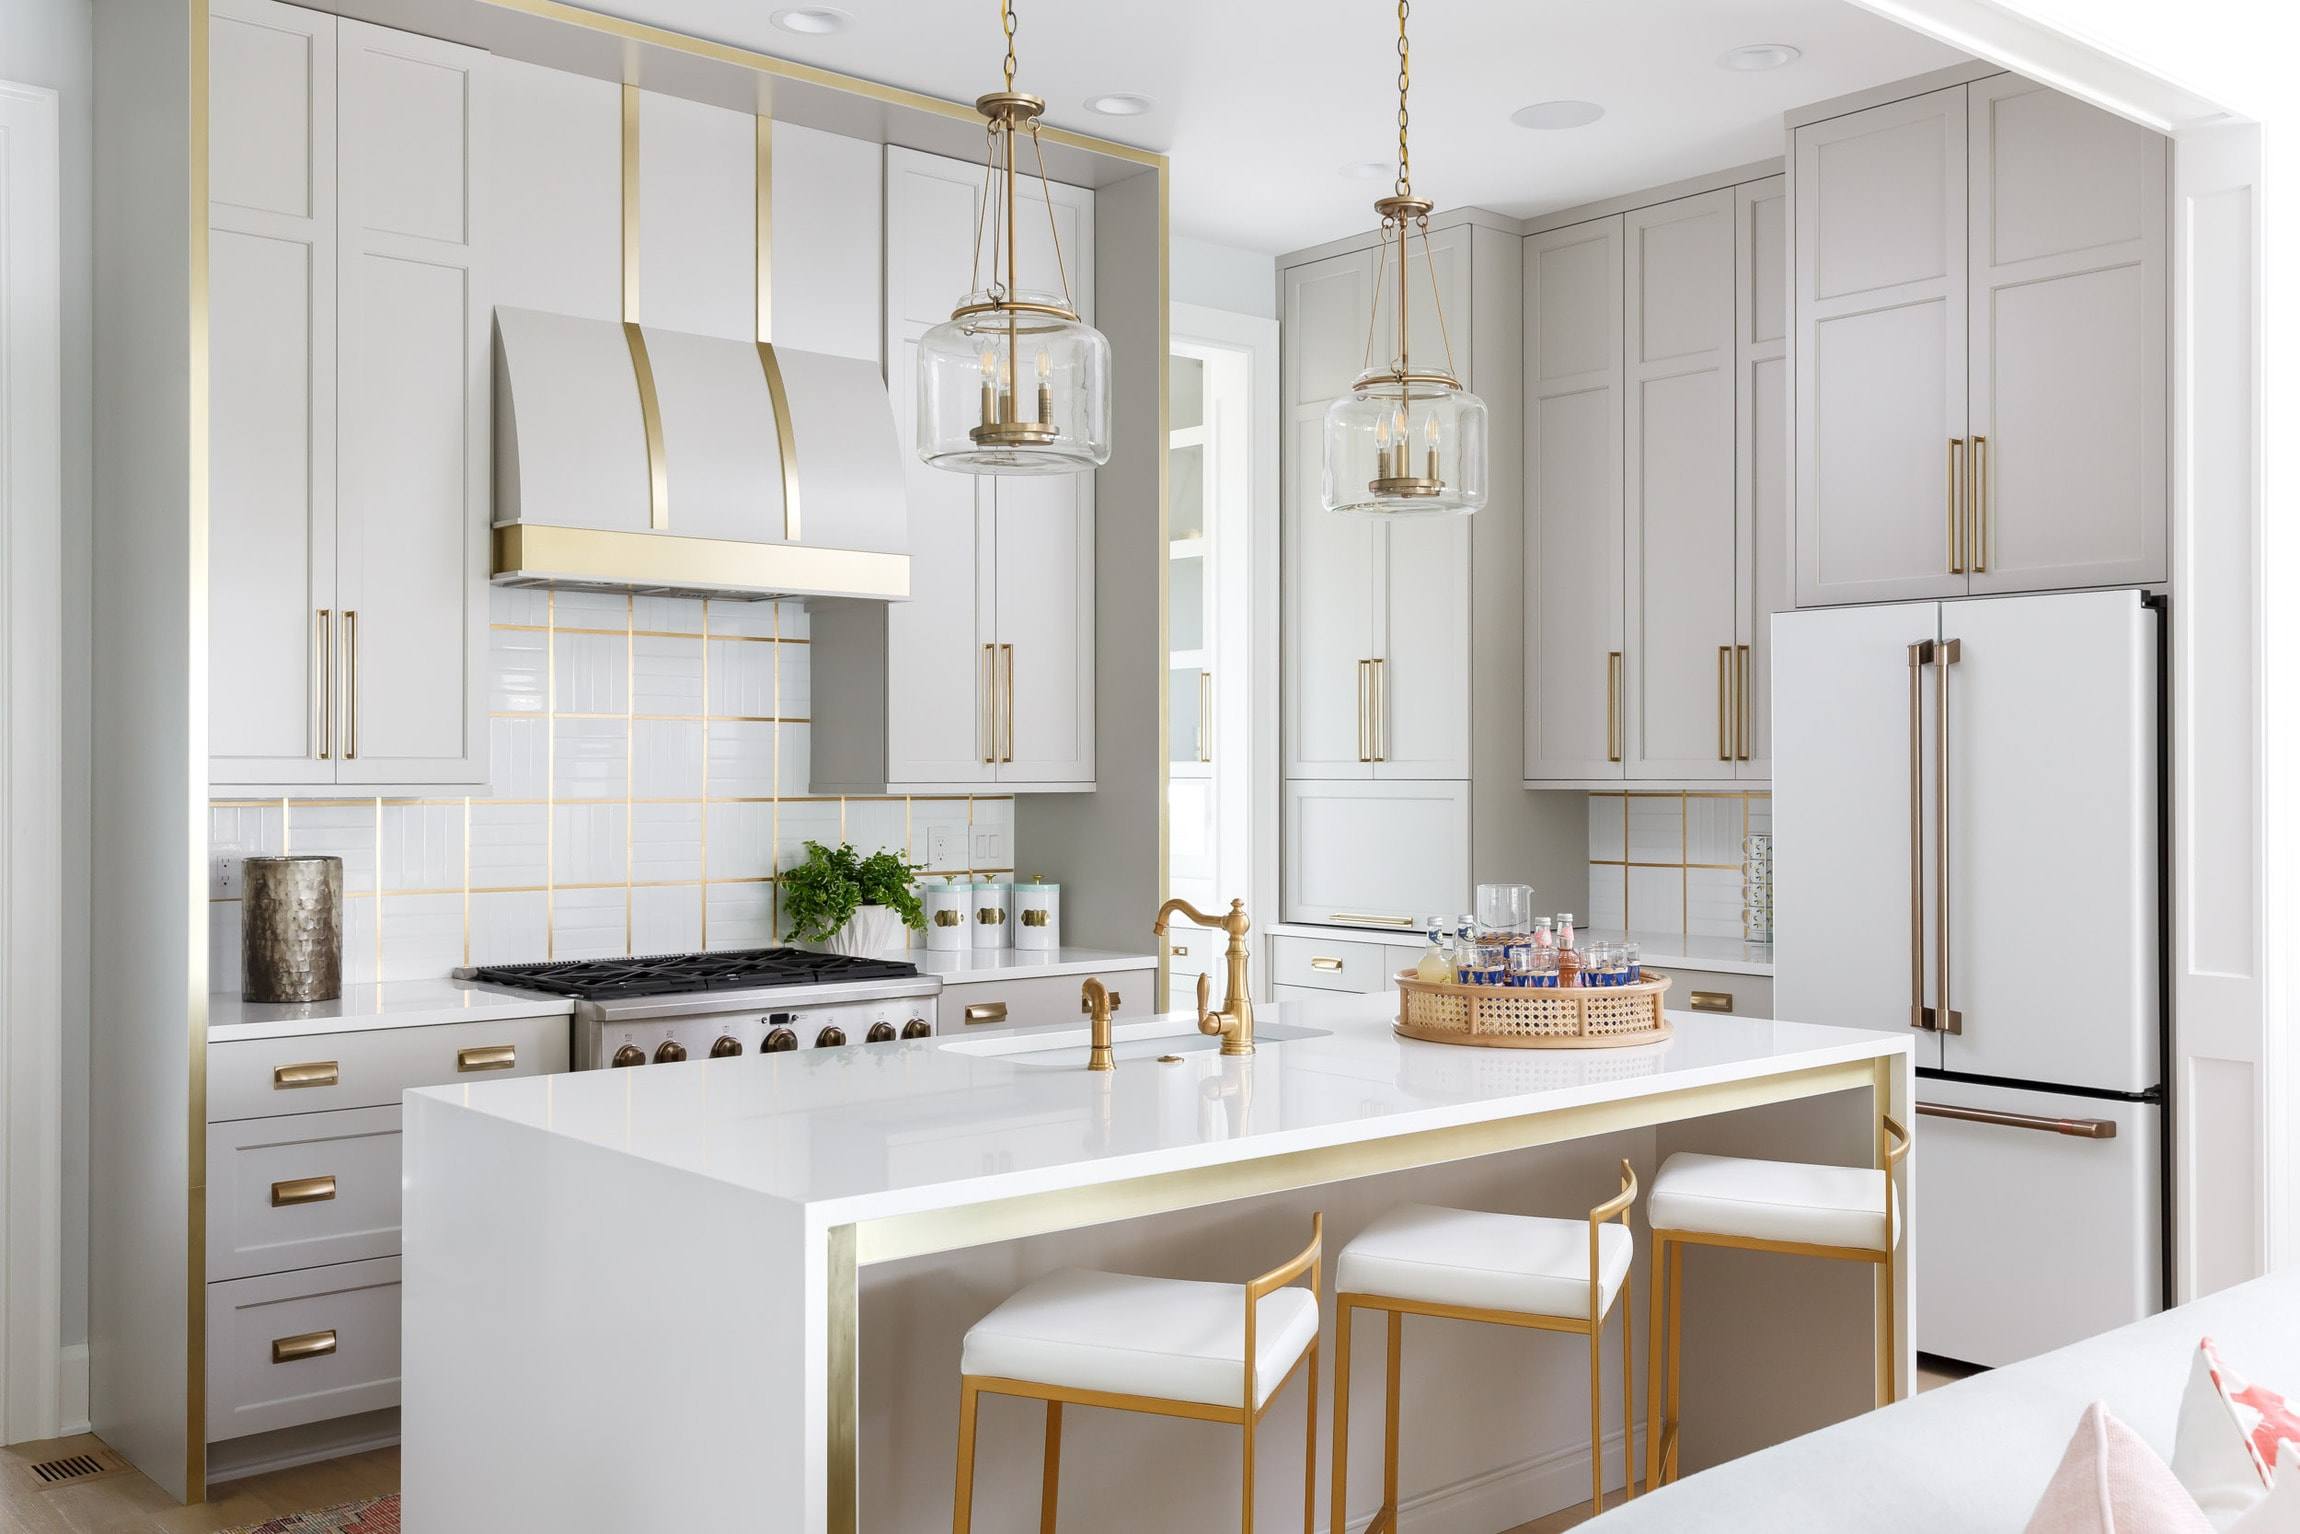 Tim Furlong Jr. - Artisan Signature Homes - Louisville - Fine Homebuilding House